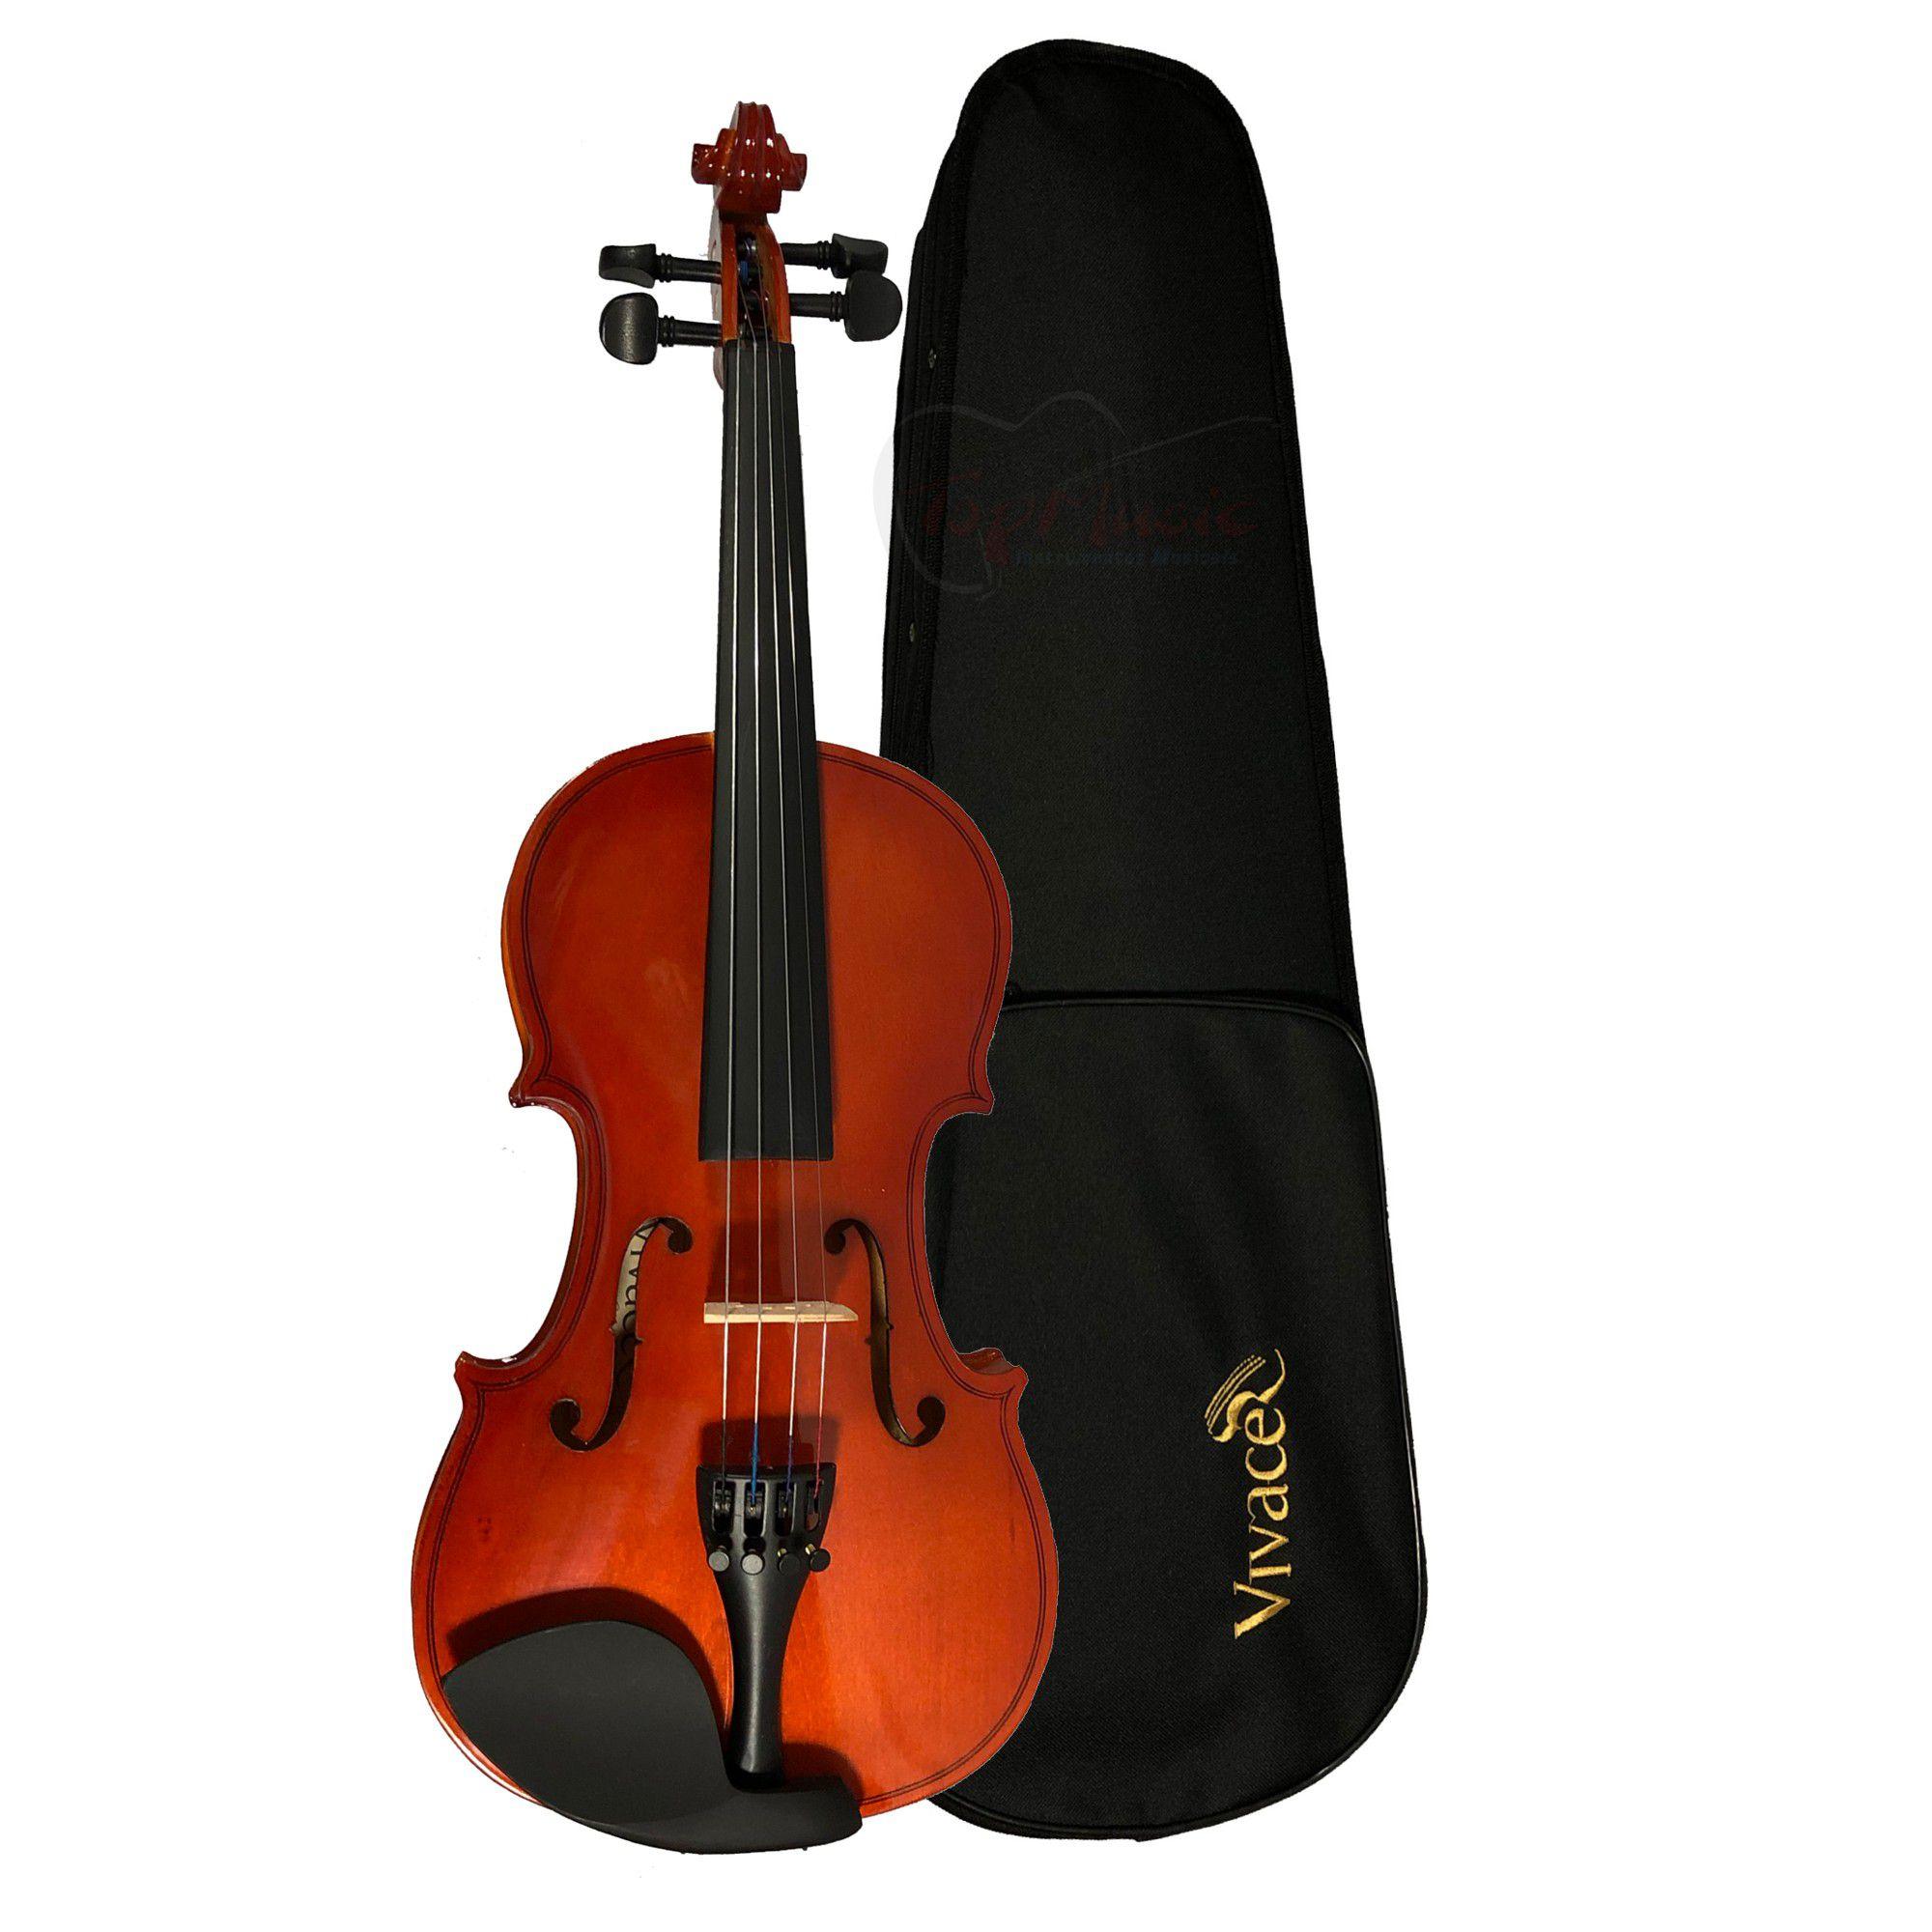 Kit Violino Vivace Mo44 4/4 Case Pedestal Espaleira Afinador